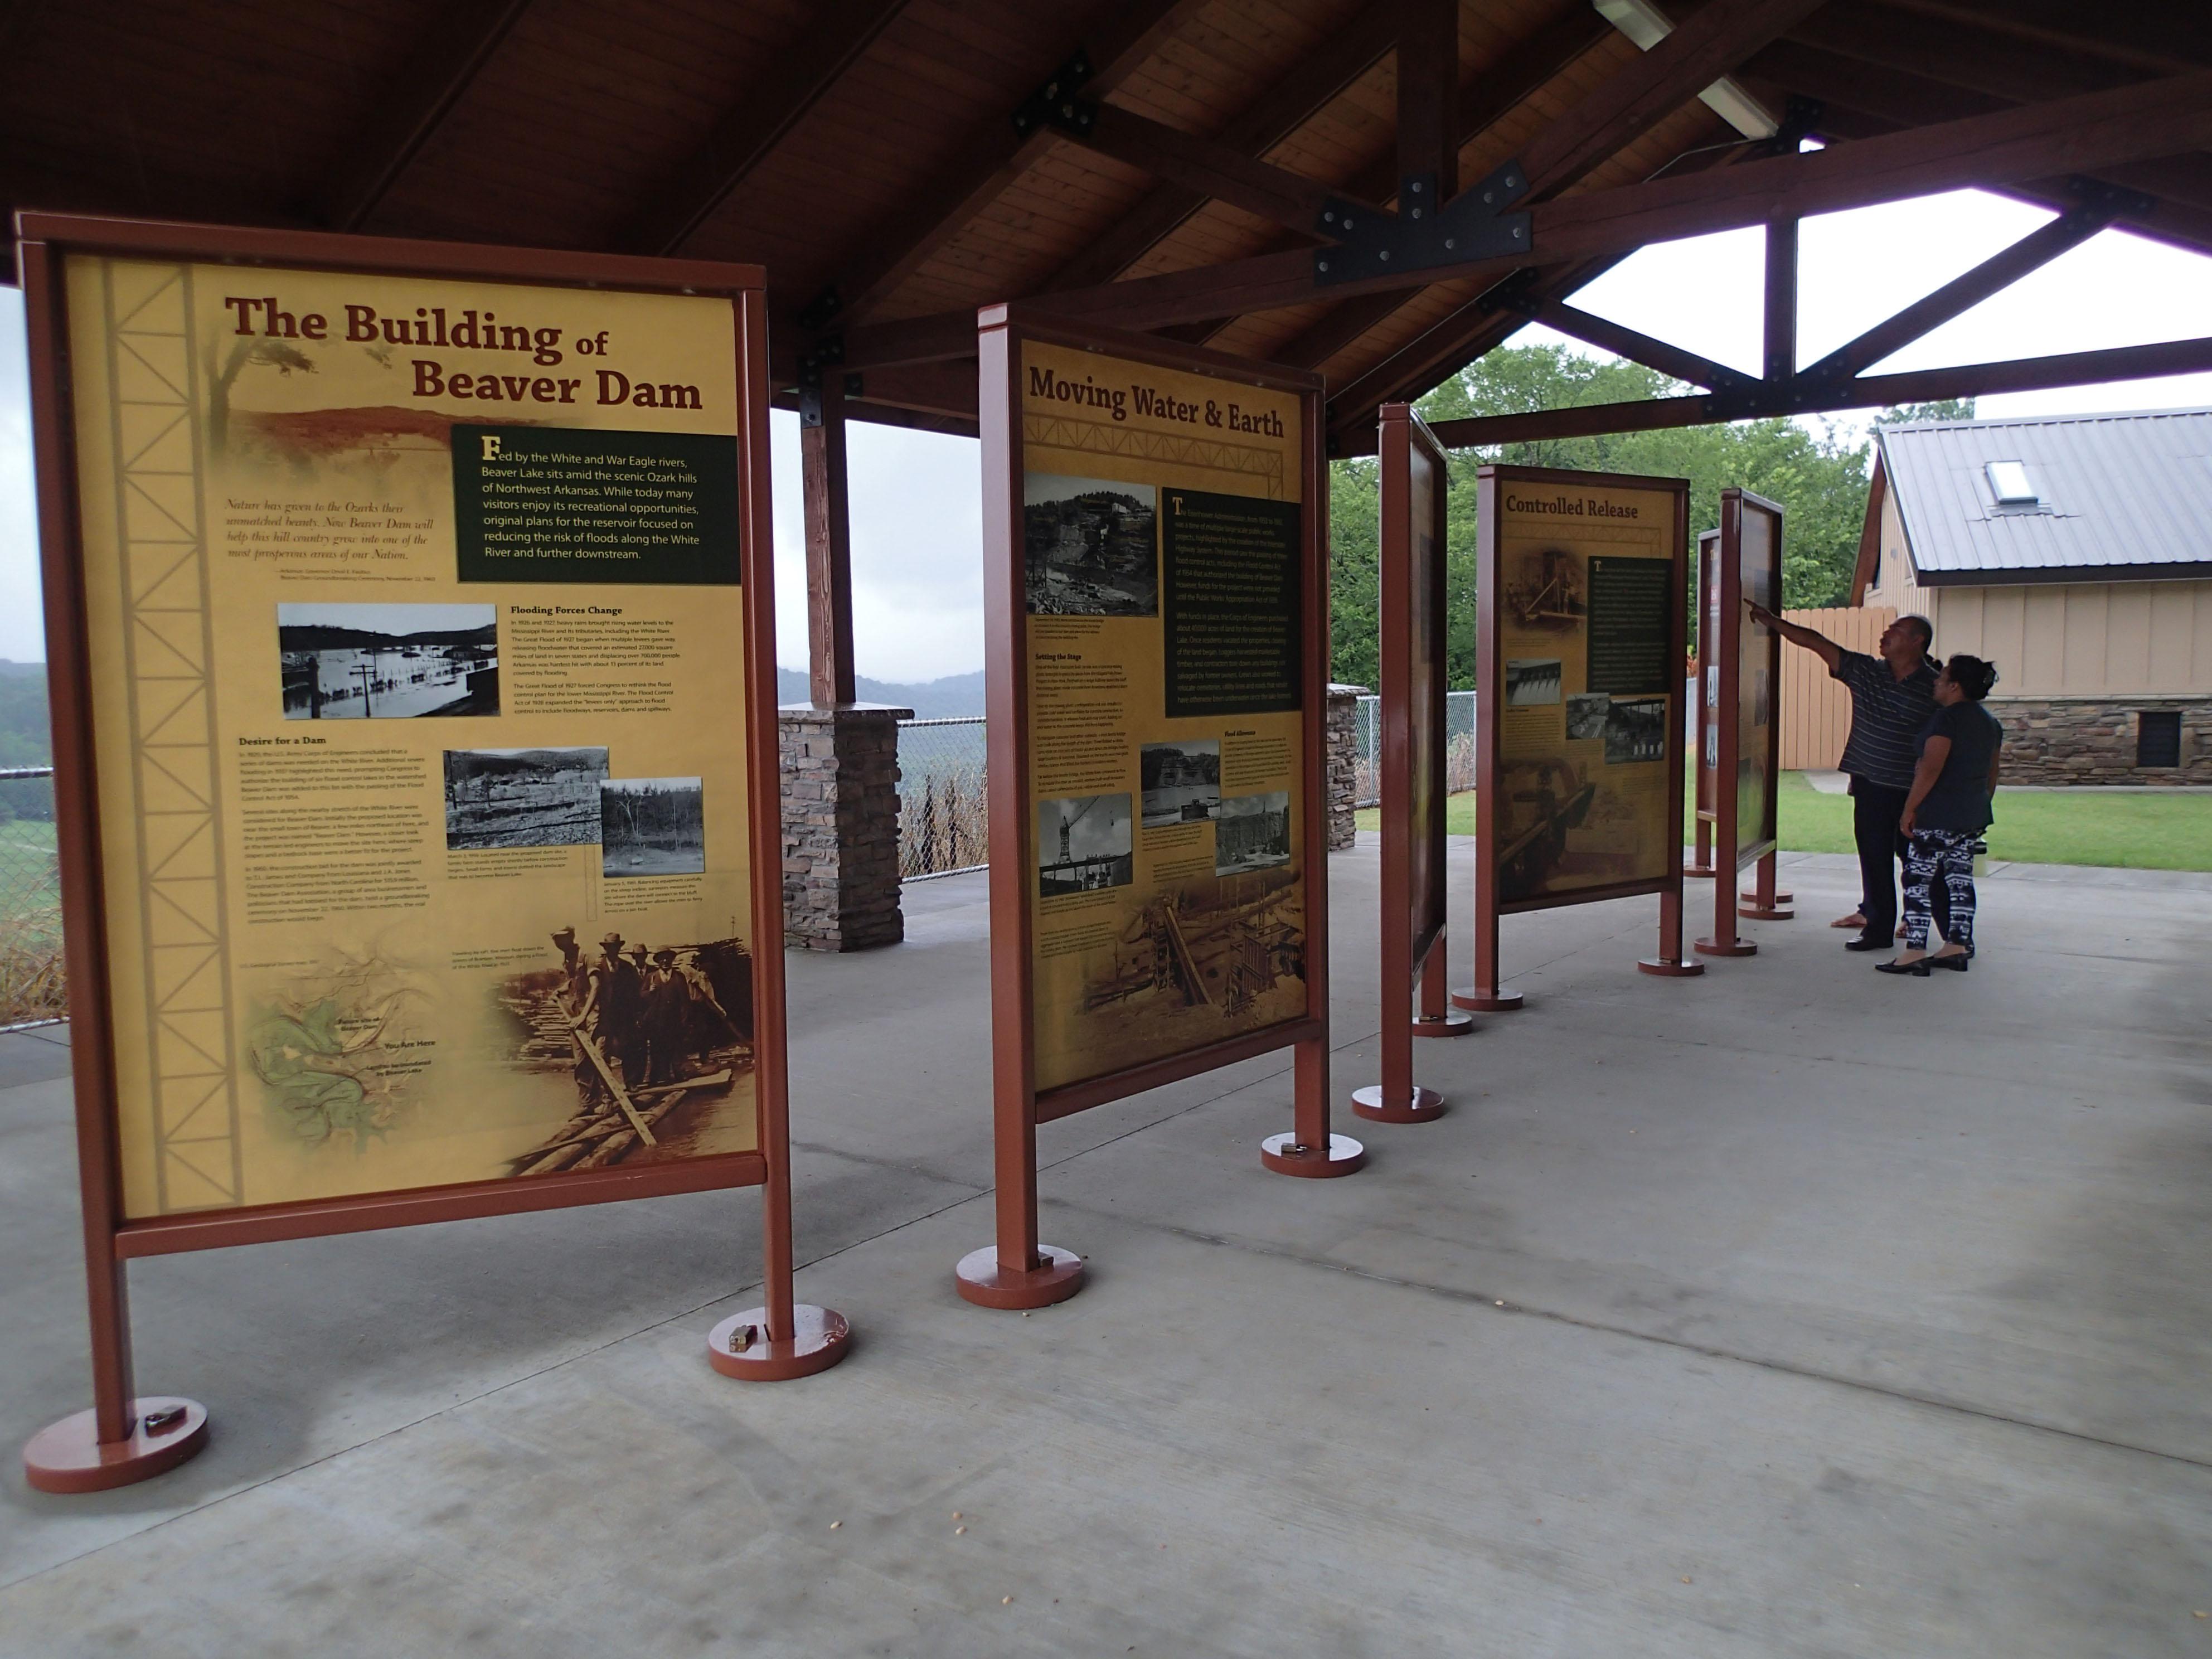 Overlook reveals history of Beaver Dam, lake